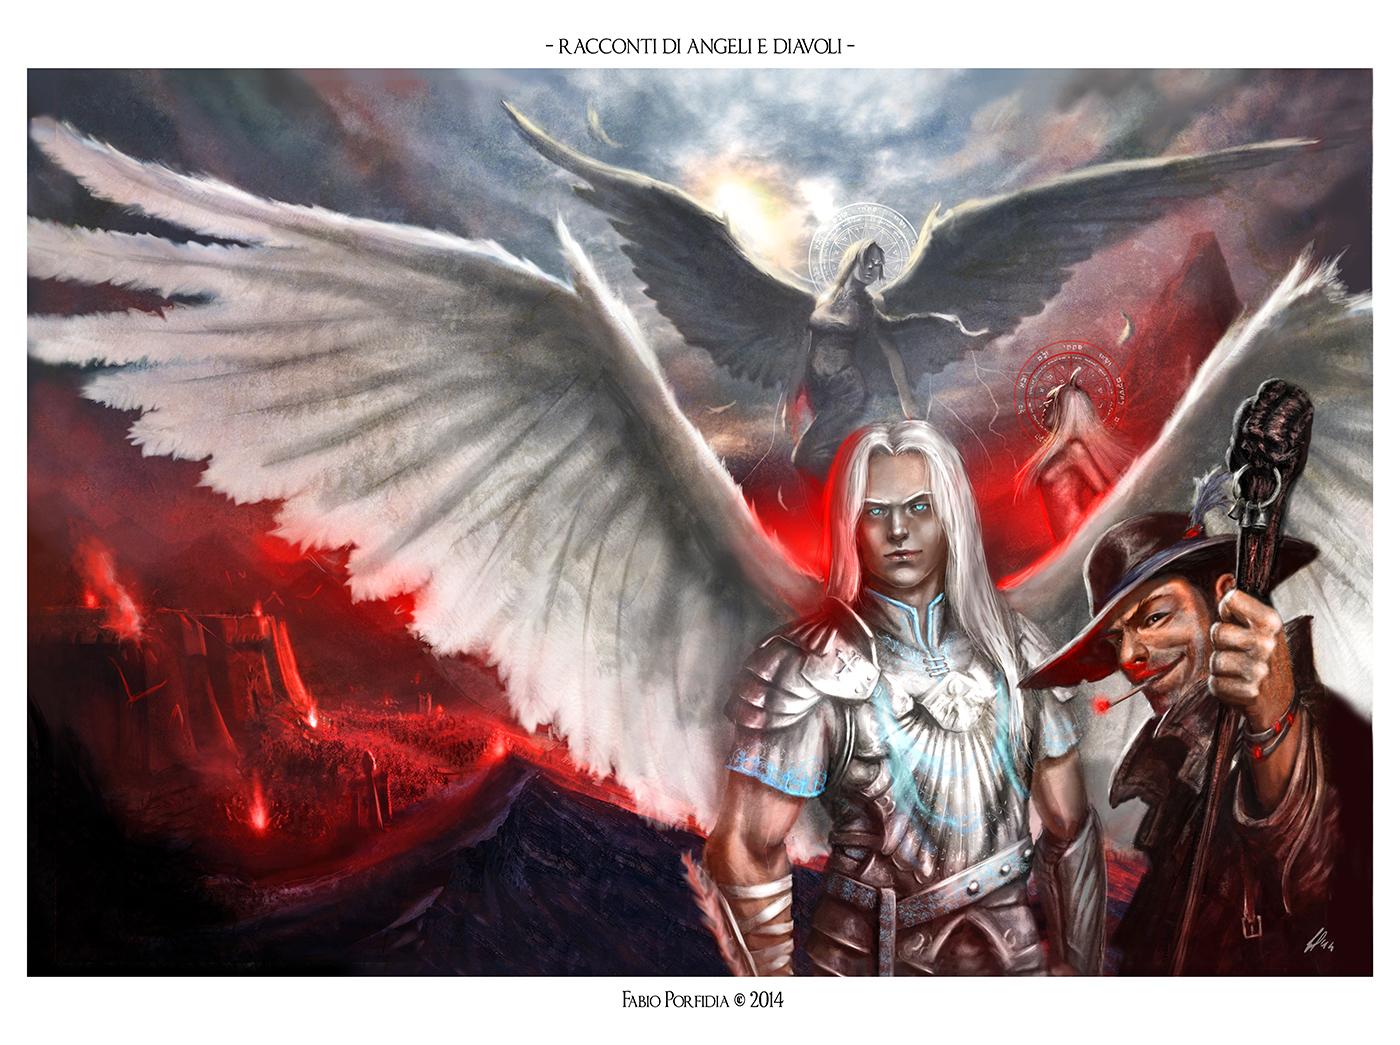 Racconti di Angeli e Diavoli